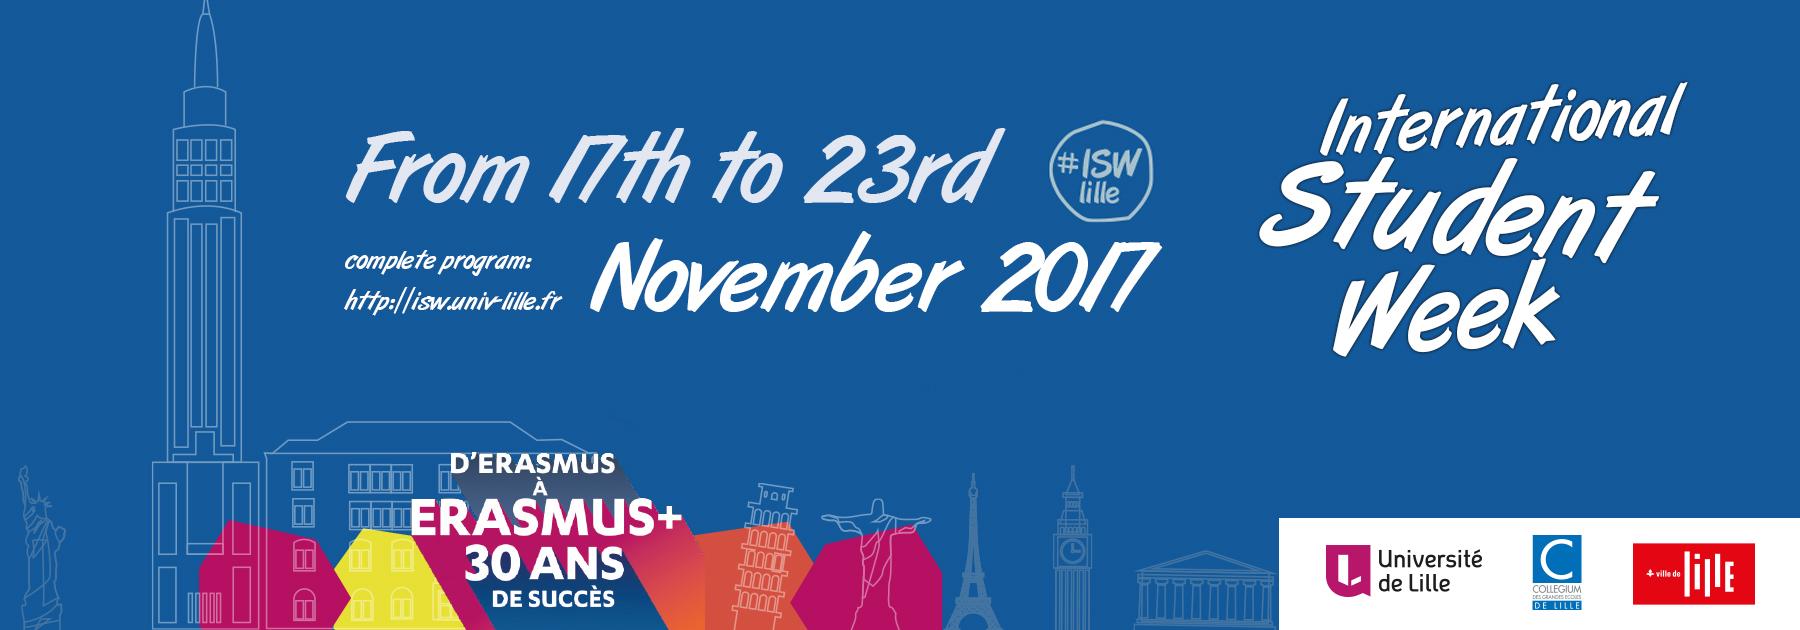 International student week